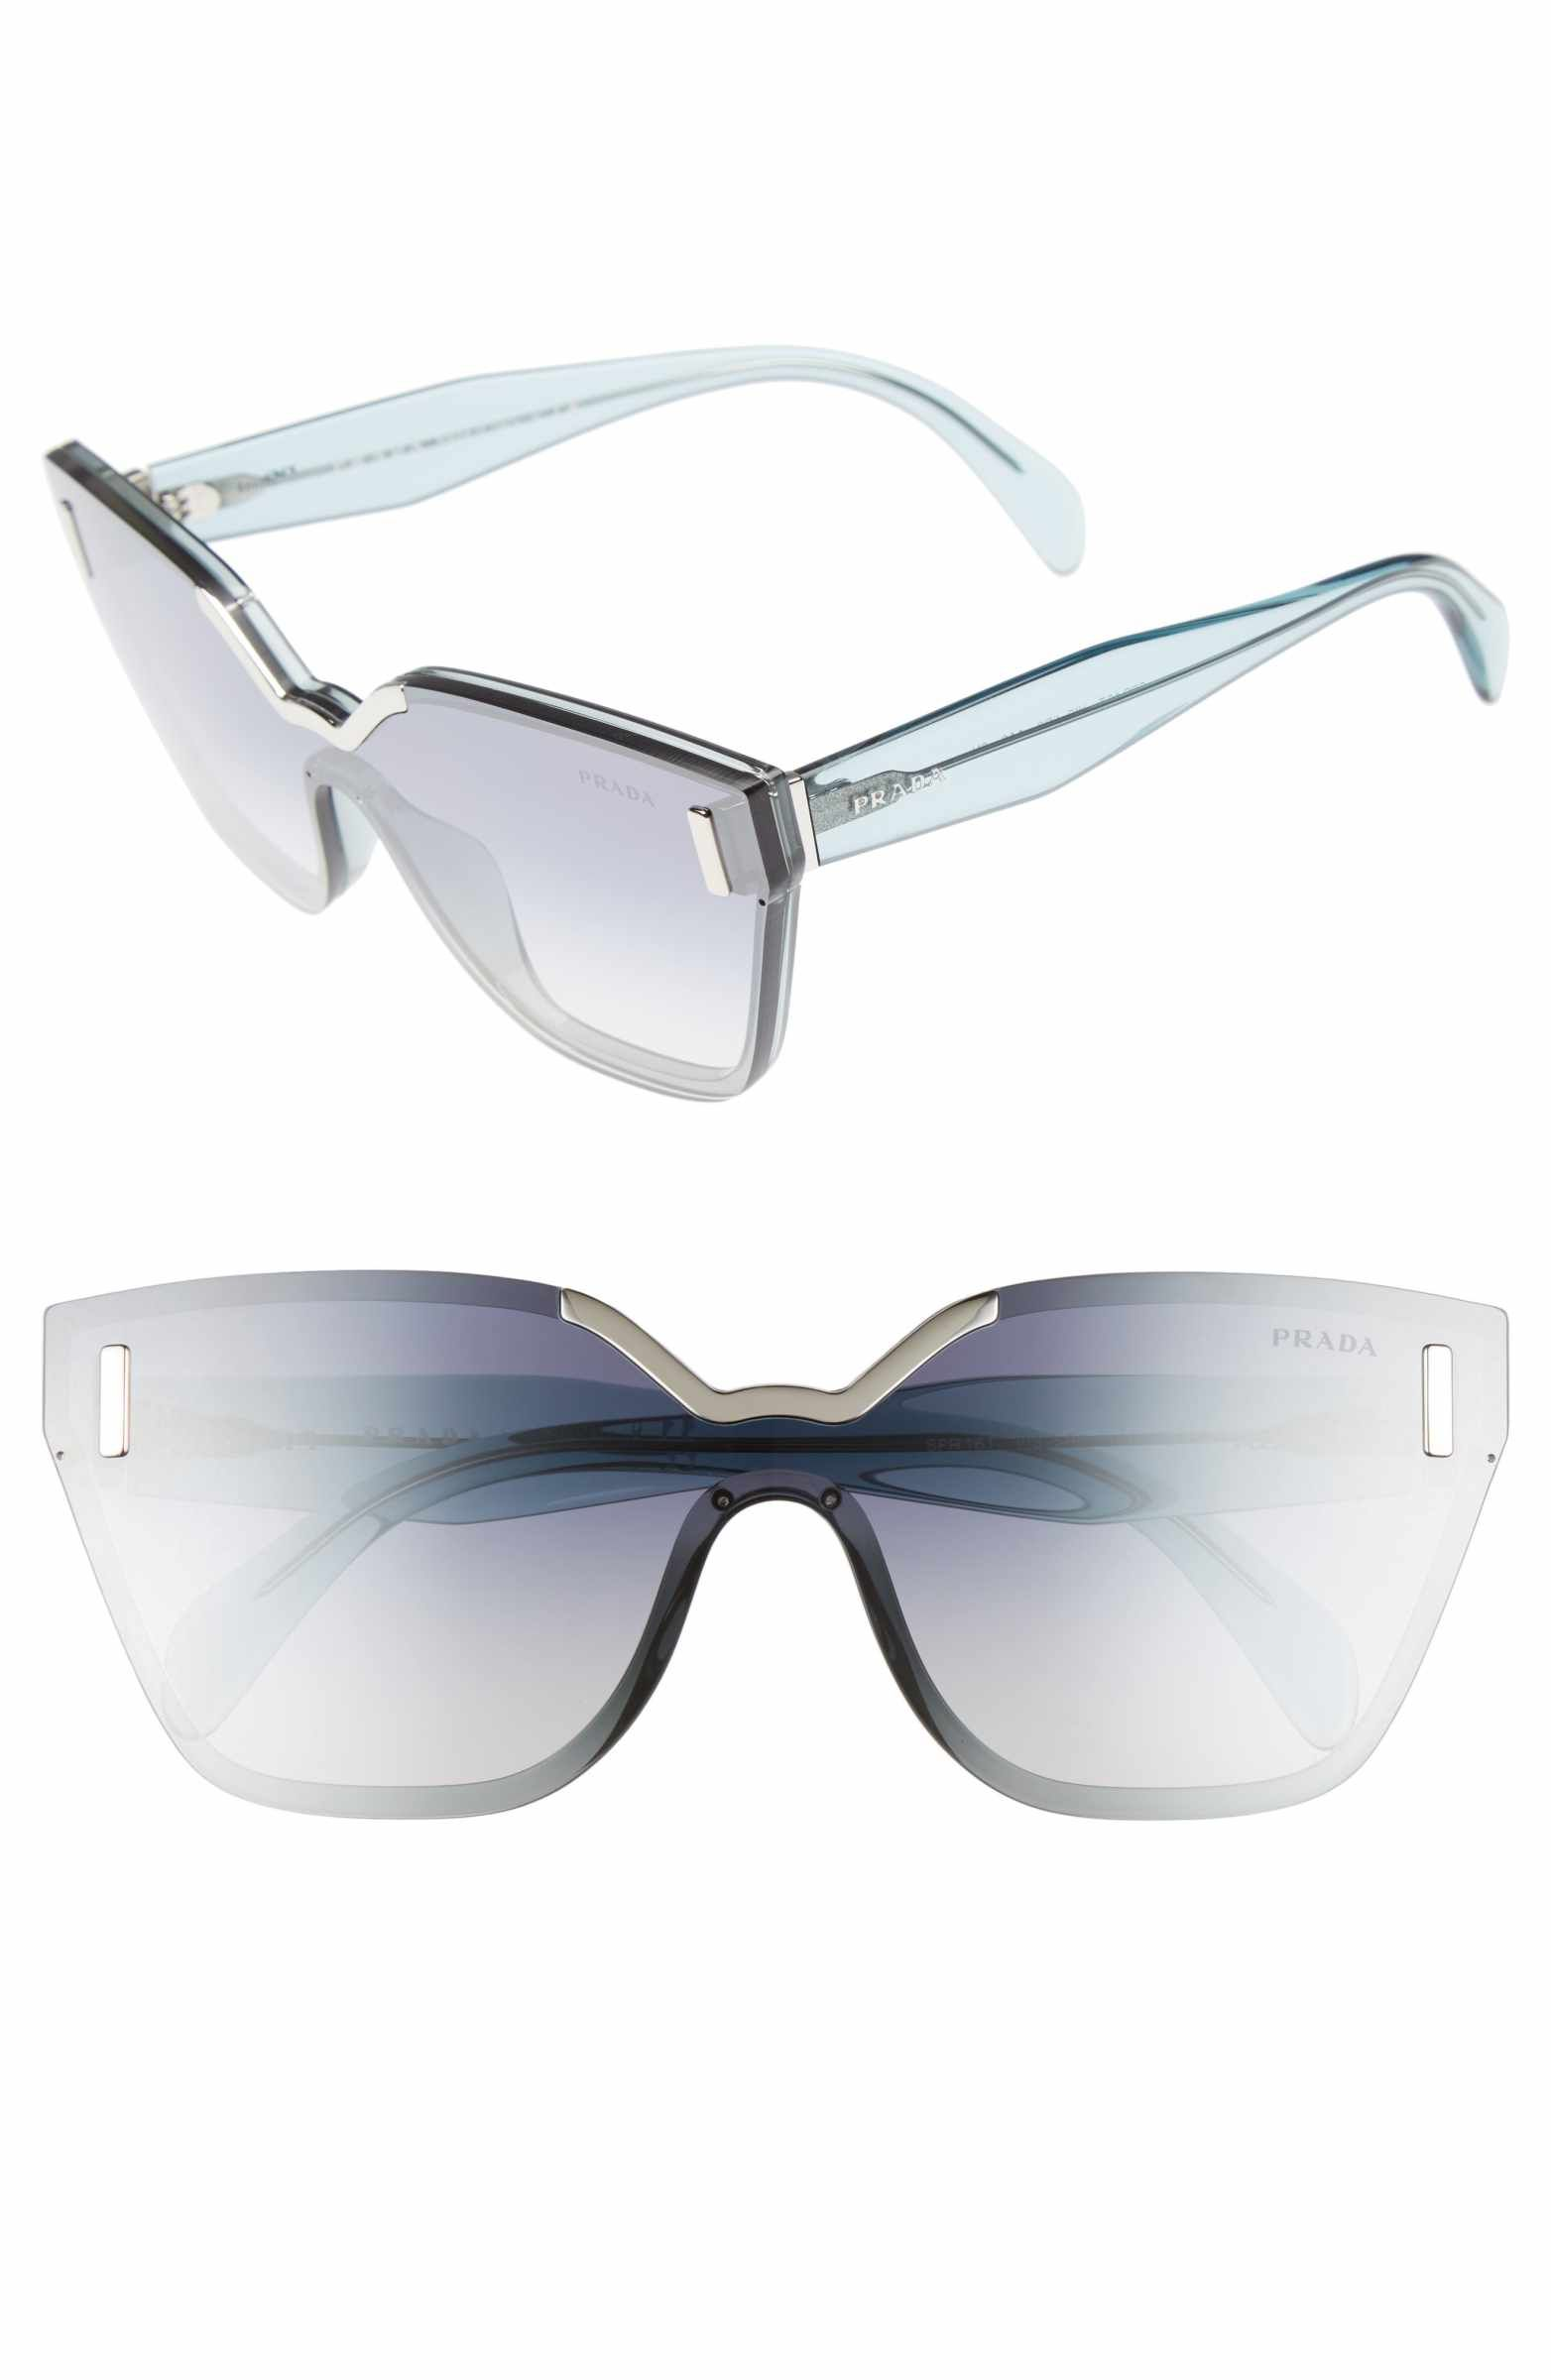 83dedc215b05 Main Image - Prada 61mm Mirrored Shield Sunglasses